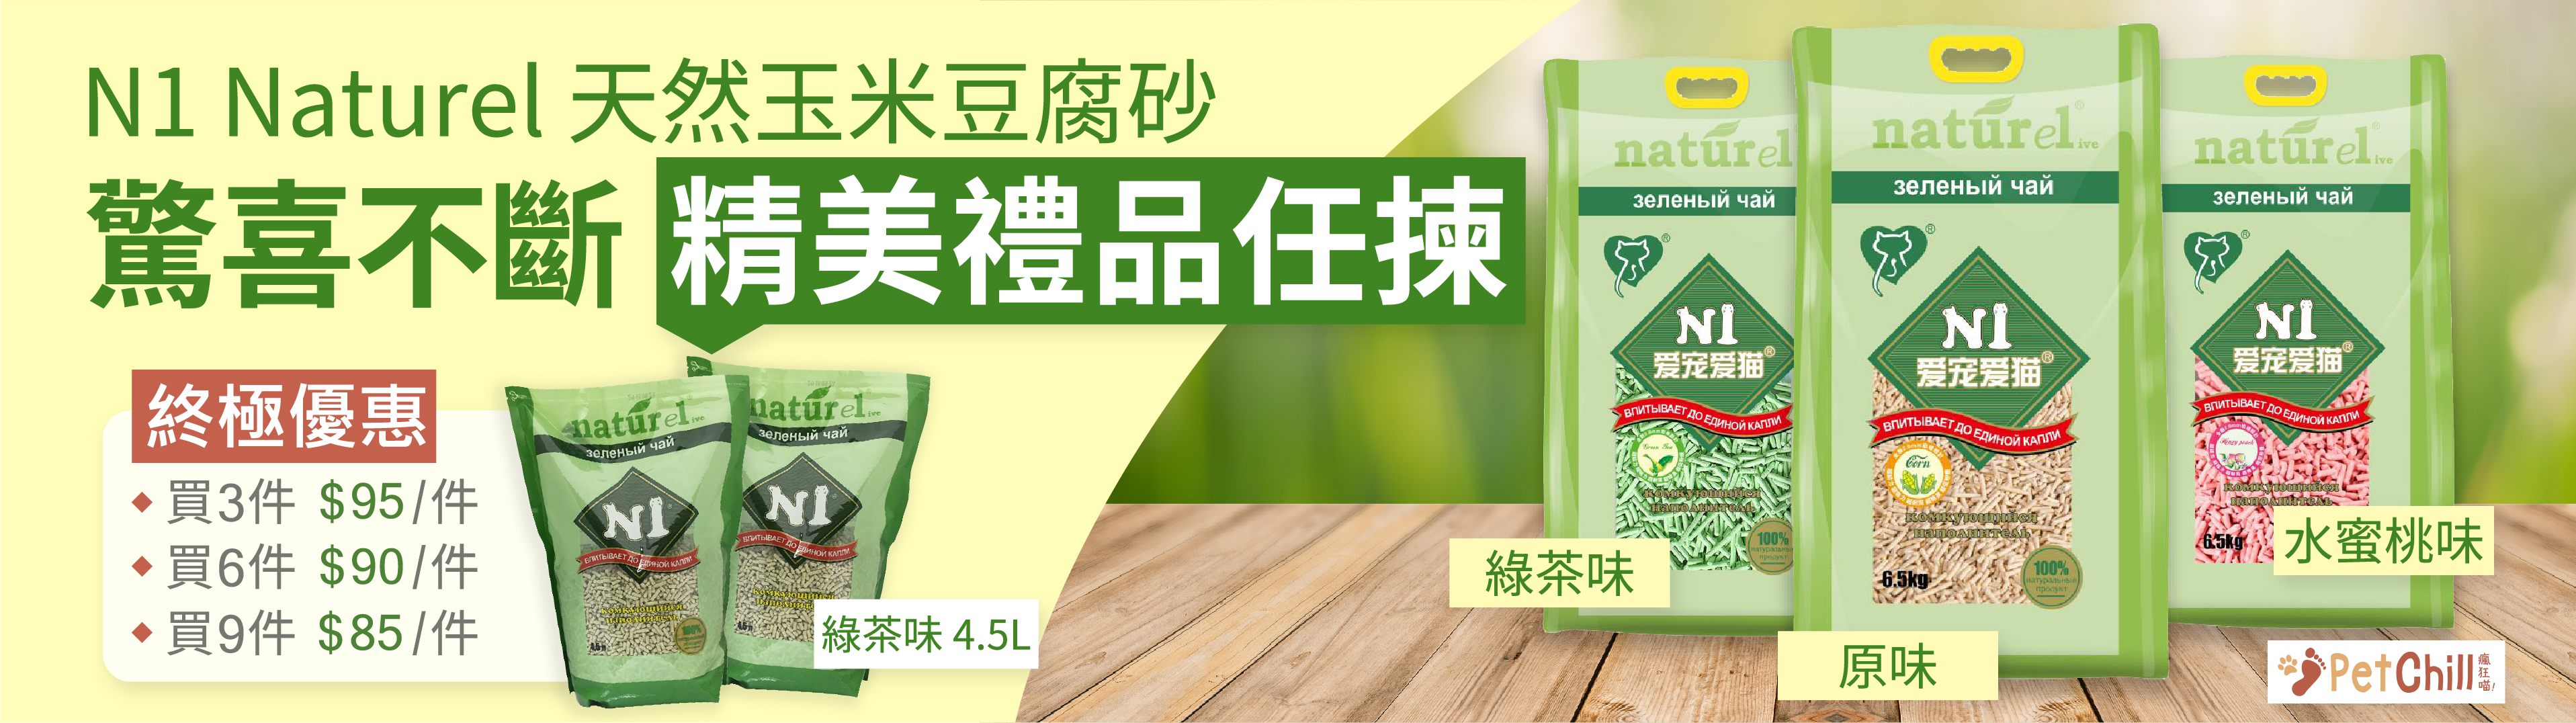 N1 naturel 天然玉米豆腐砂 petchillhk.com